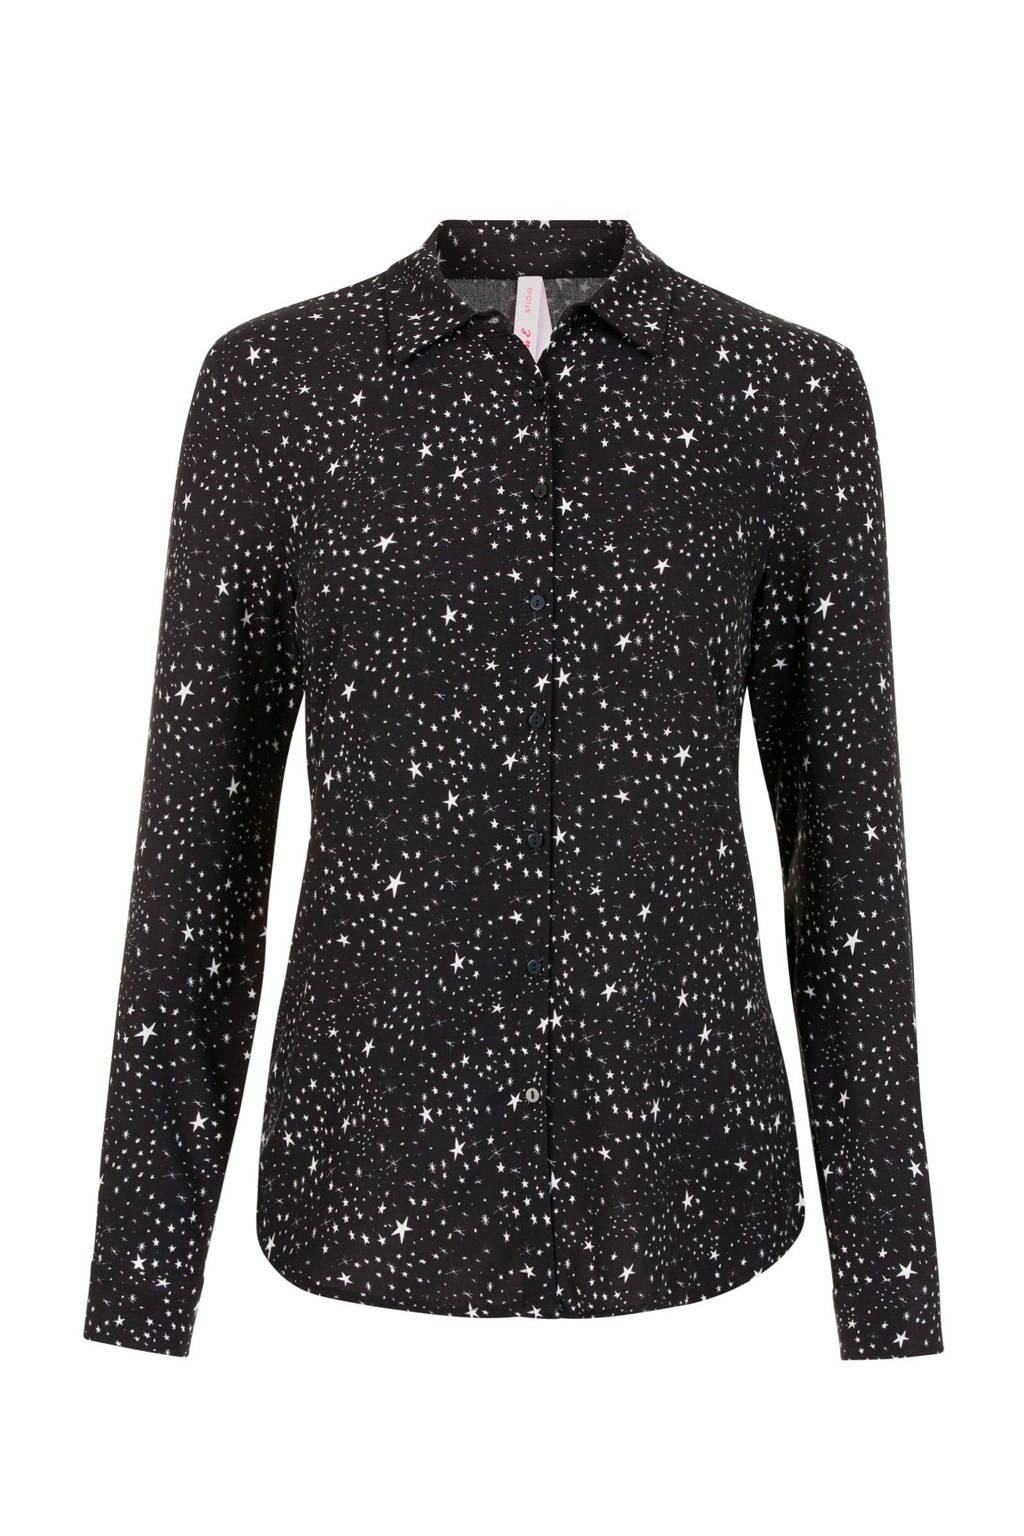 Miss Etam Regulier blouse met contrastbies zwart/wit, Zwart/wit